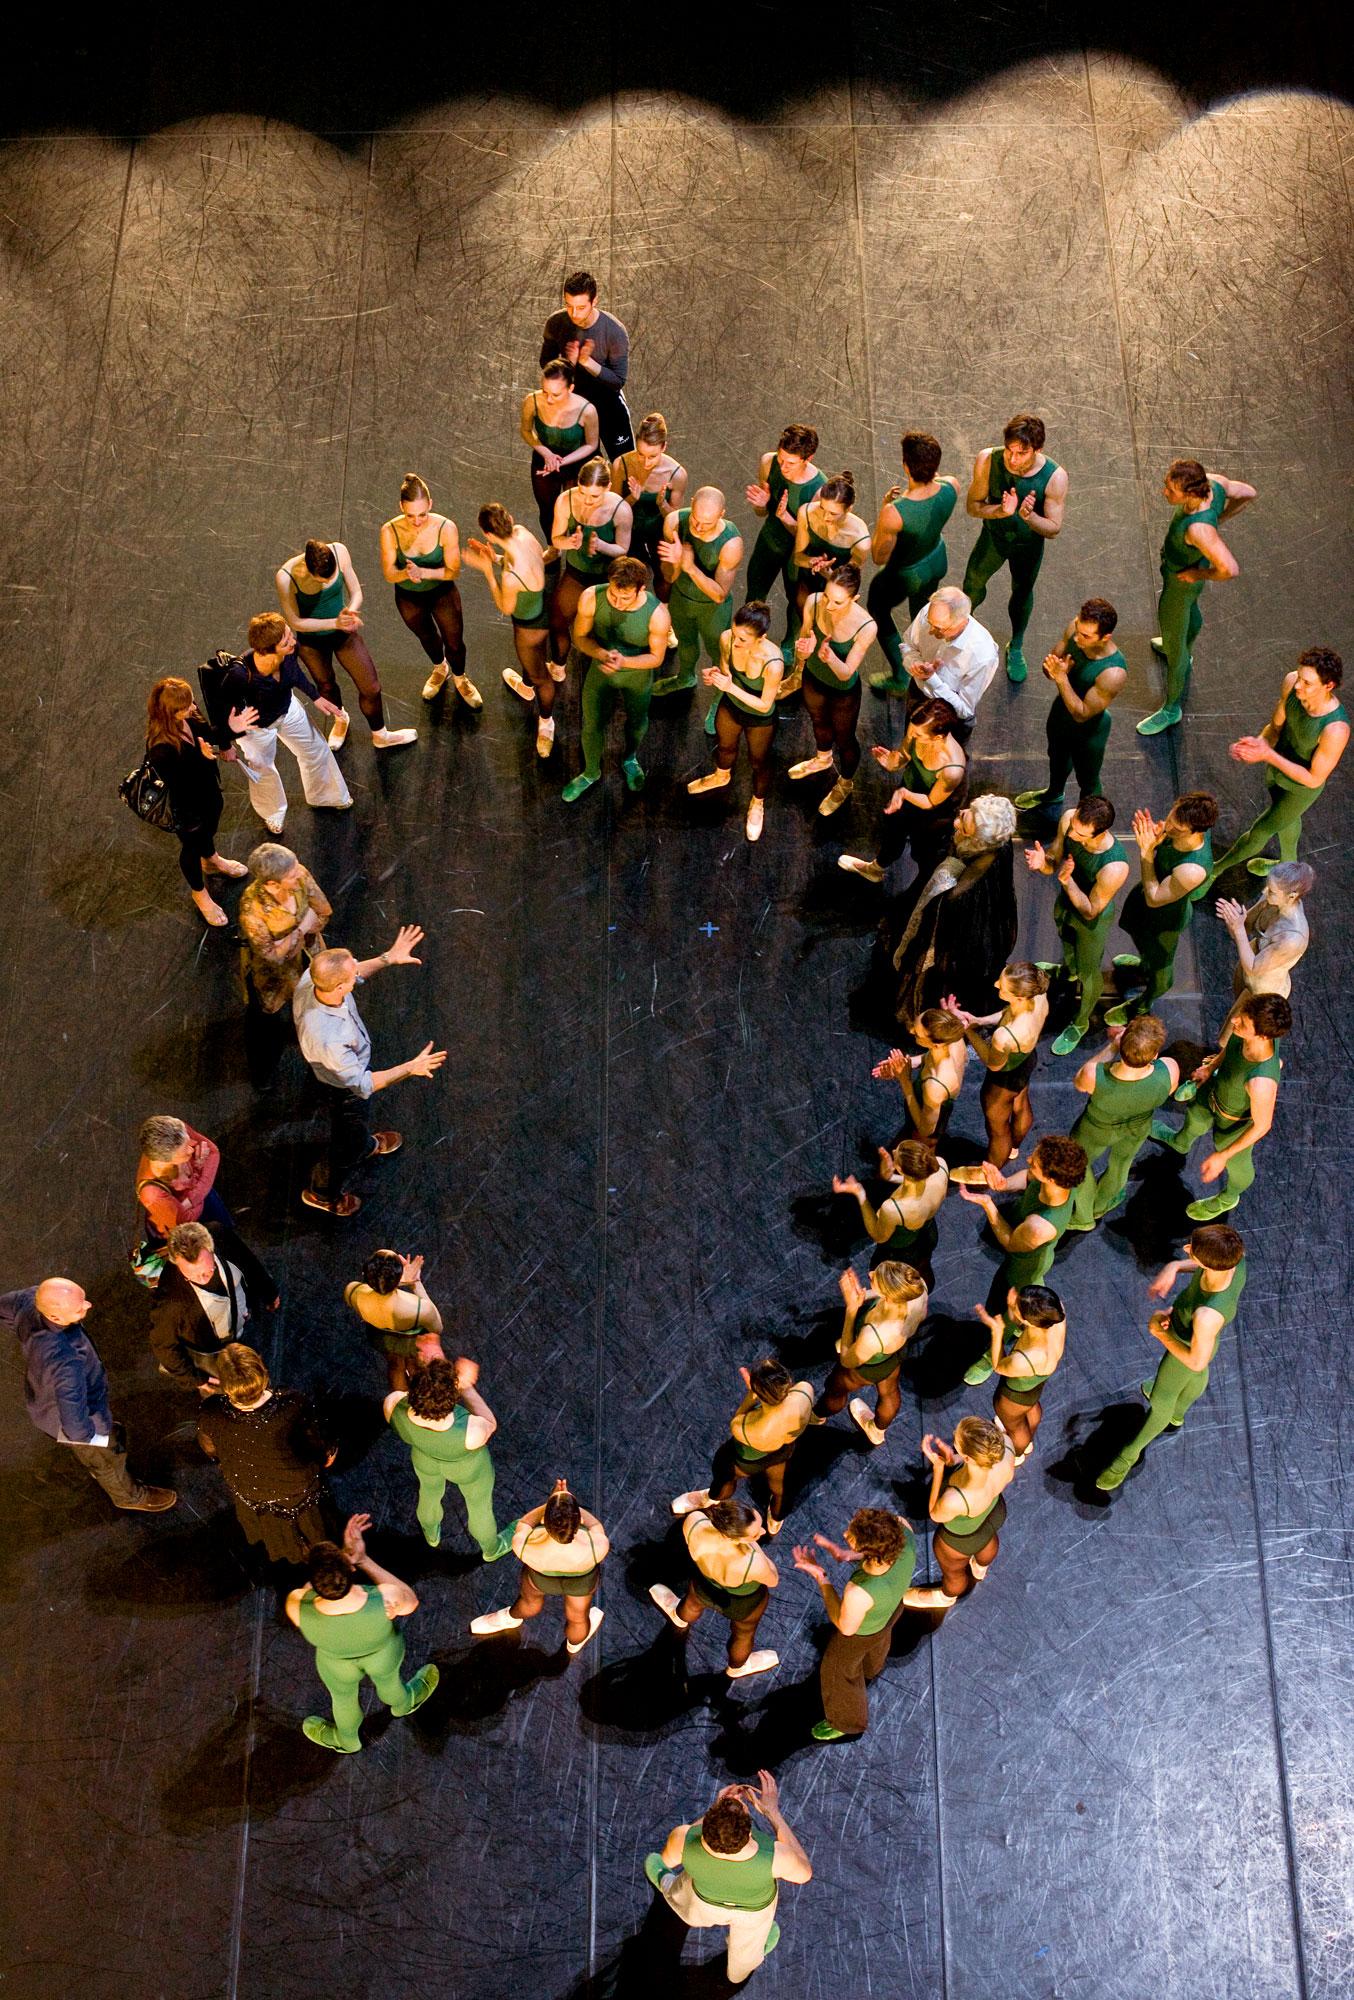 William Forsythe, Royal Ballet of Flanders, Bill Forsythe, Frankfurt Ballet